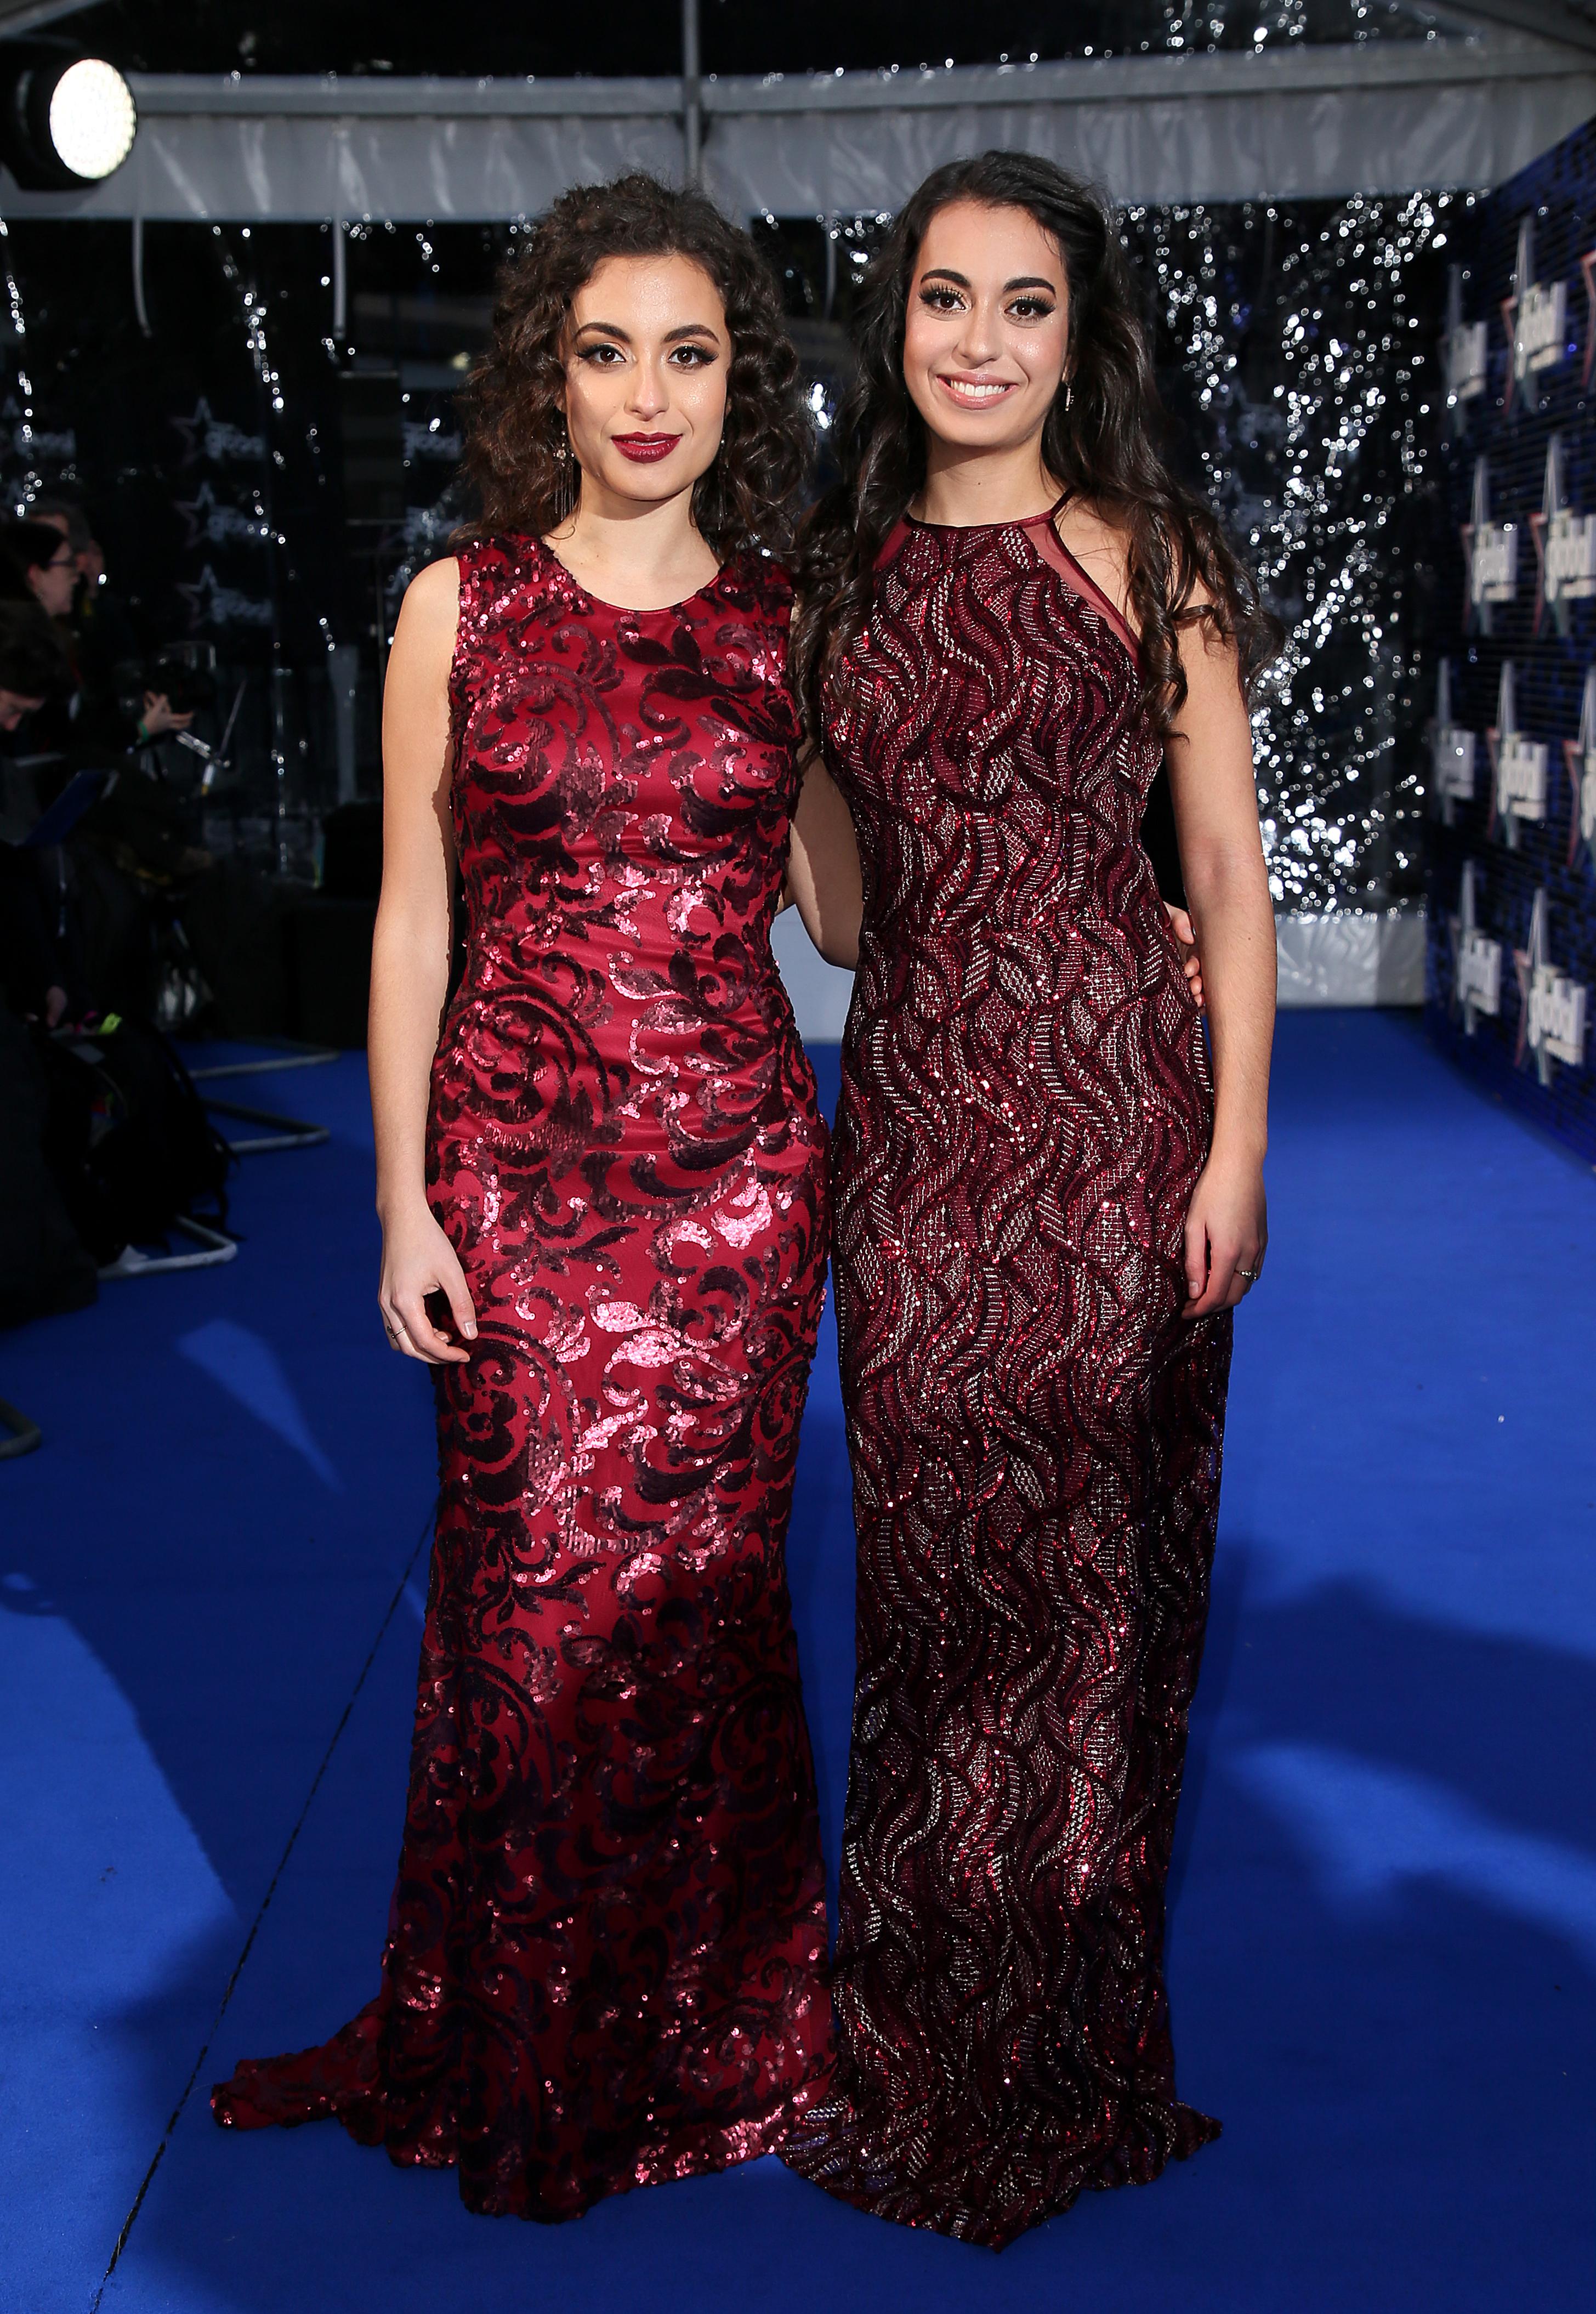 Sarah Ayoub and Laura Ayoub Global Awards 2018 blu